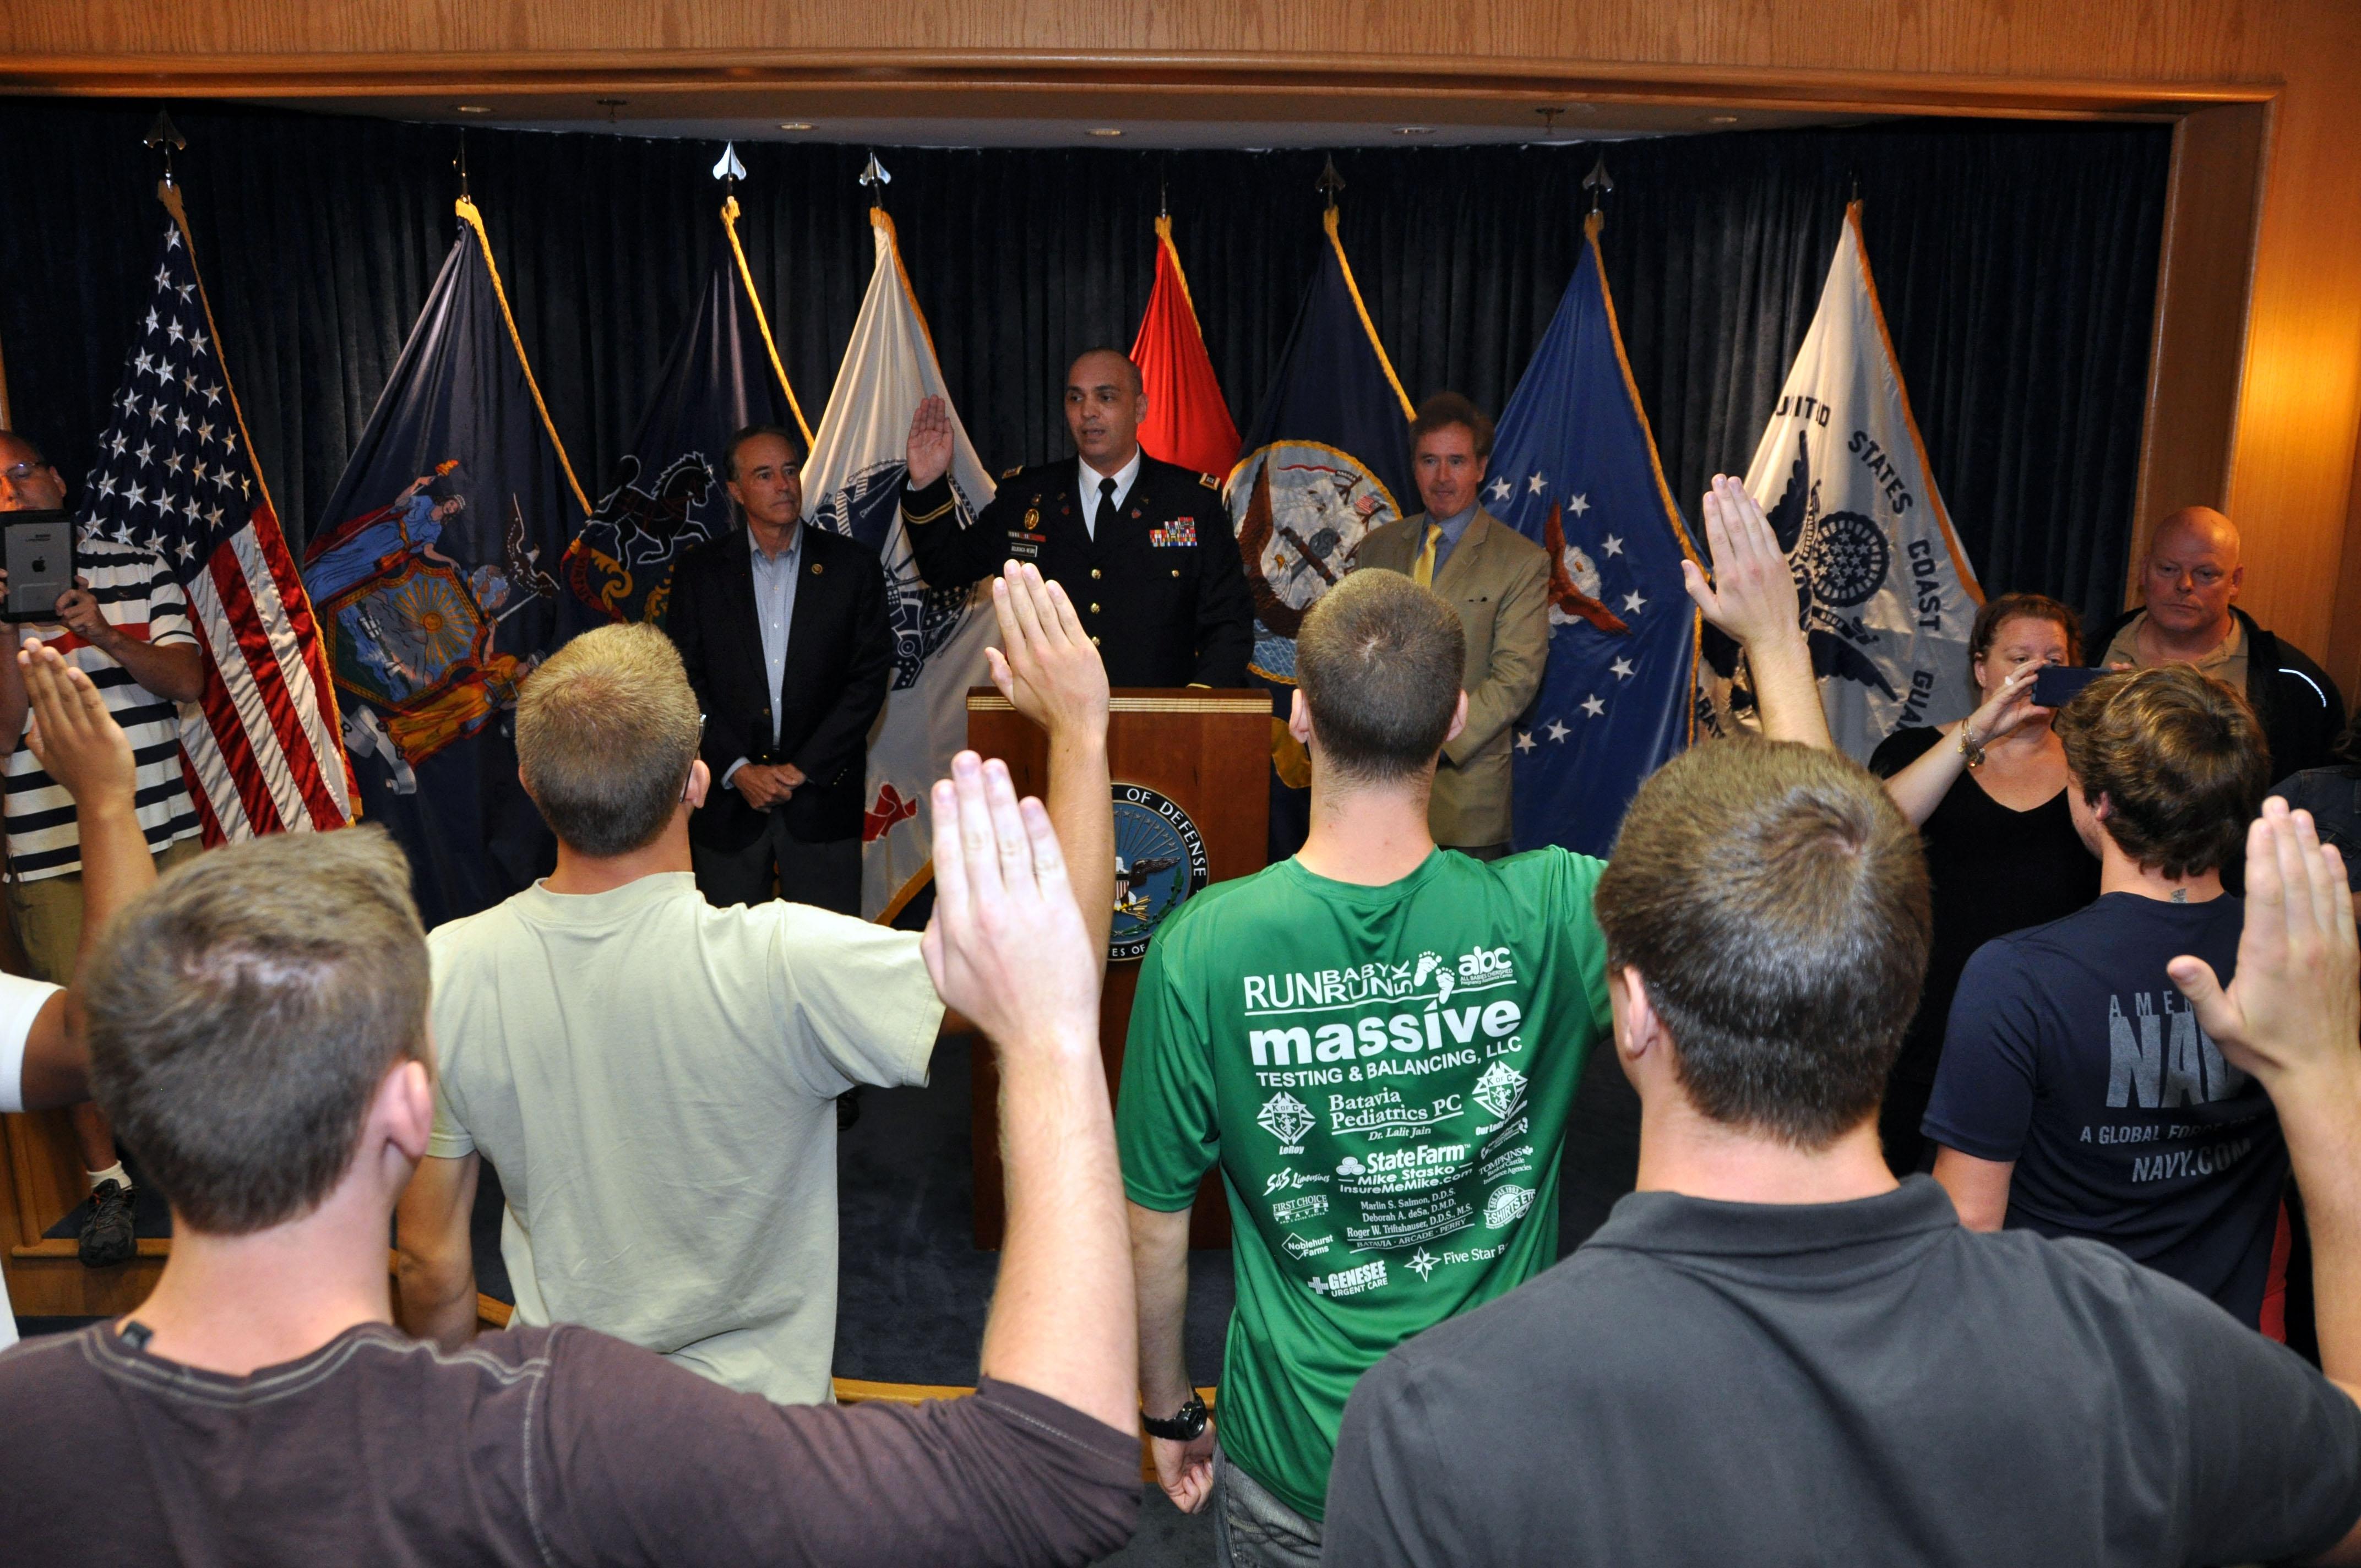 Two WNY congressmen witness Oath of Enlistment > Niagara